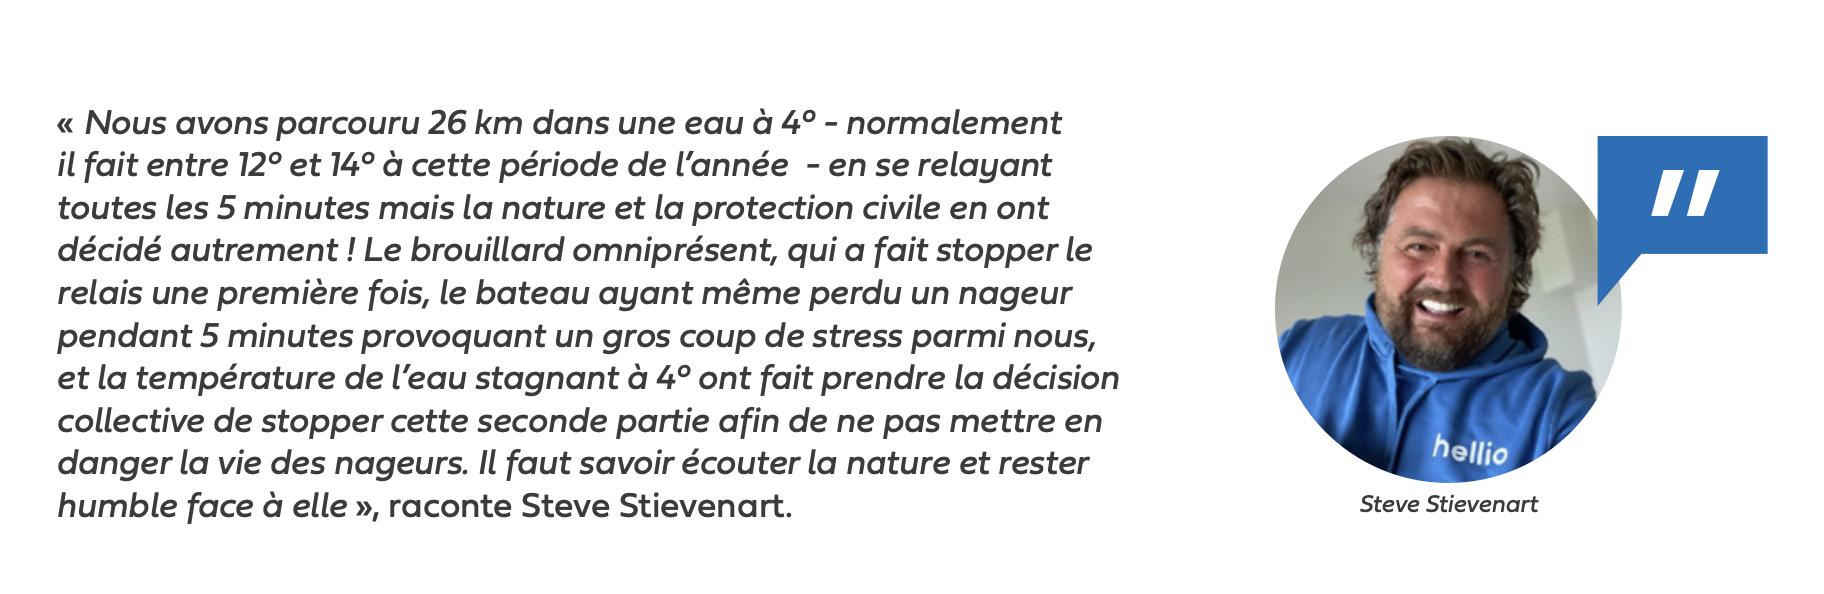 Steve-stievenart-citation